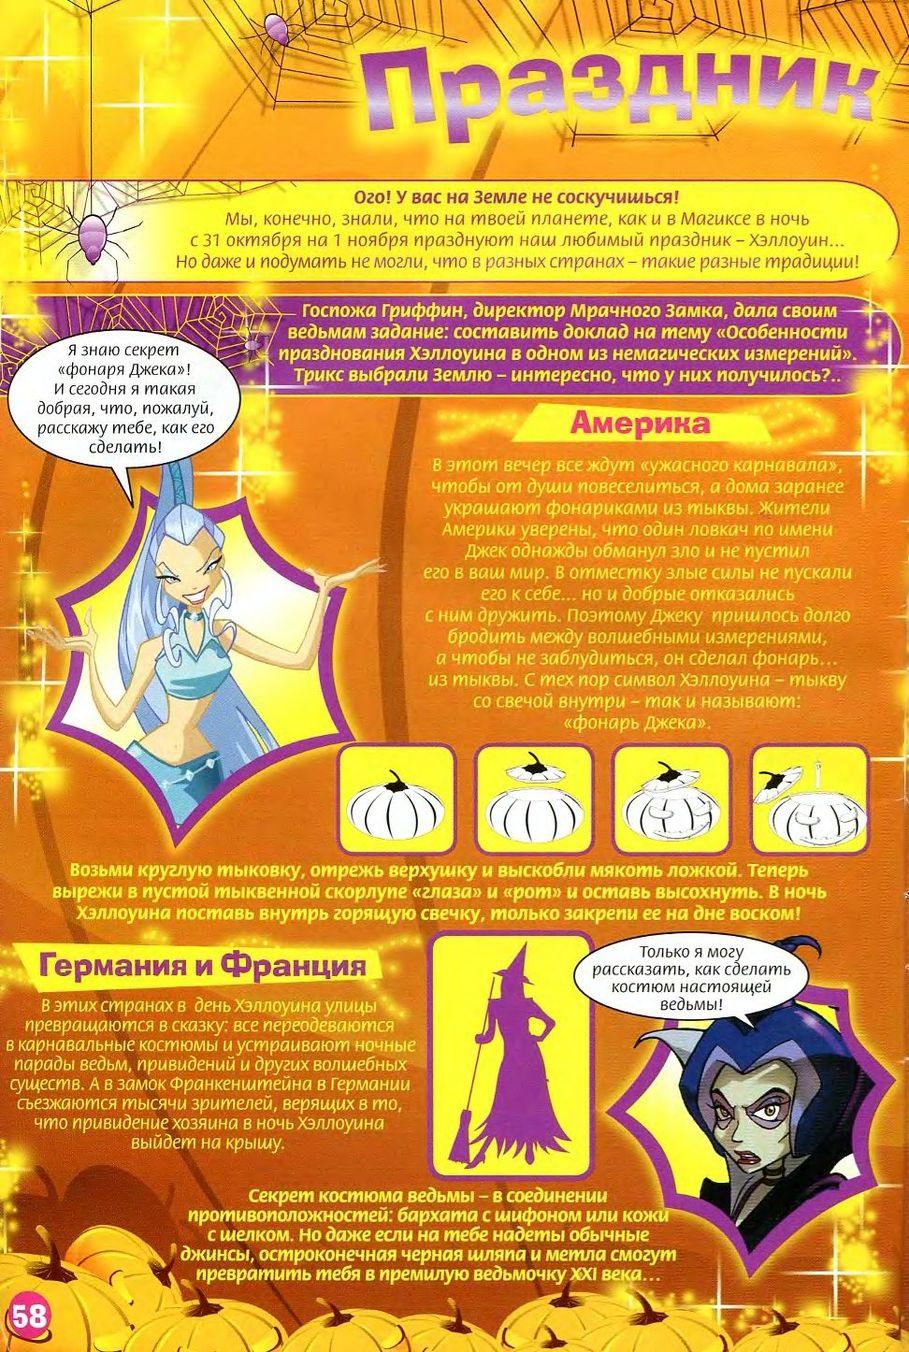 Комикс Винкс Winx - Профессор из будущего (Журнал Винкс №10 2009)